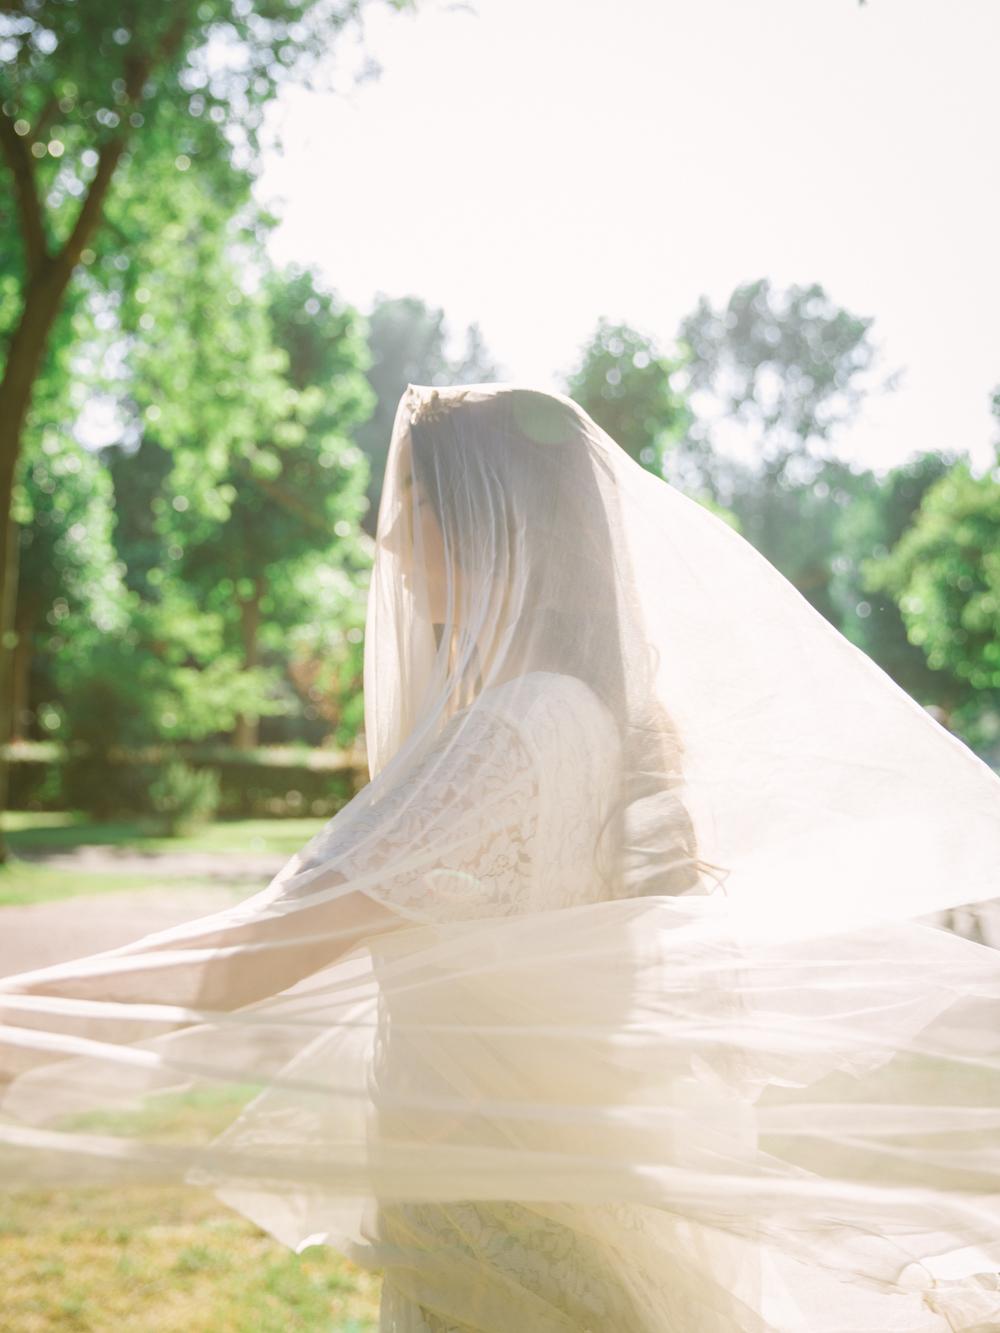 Romantisch zomer bruiloft inspiratie © CHYMO & MORE Photography